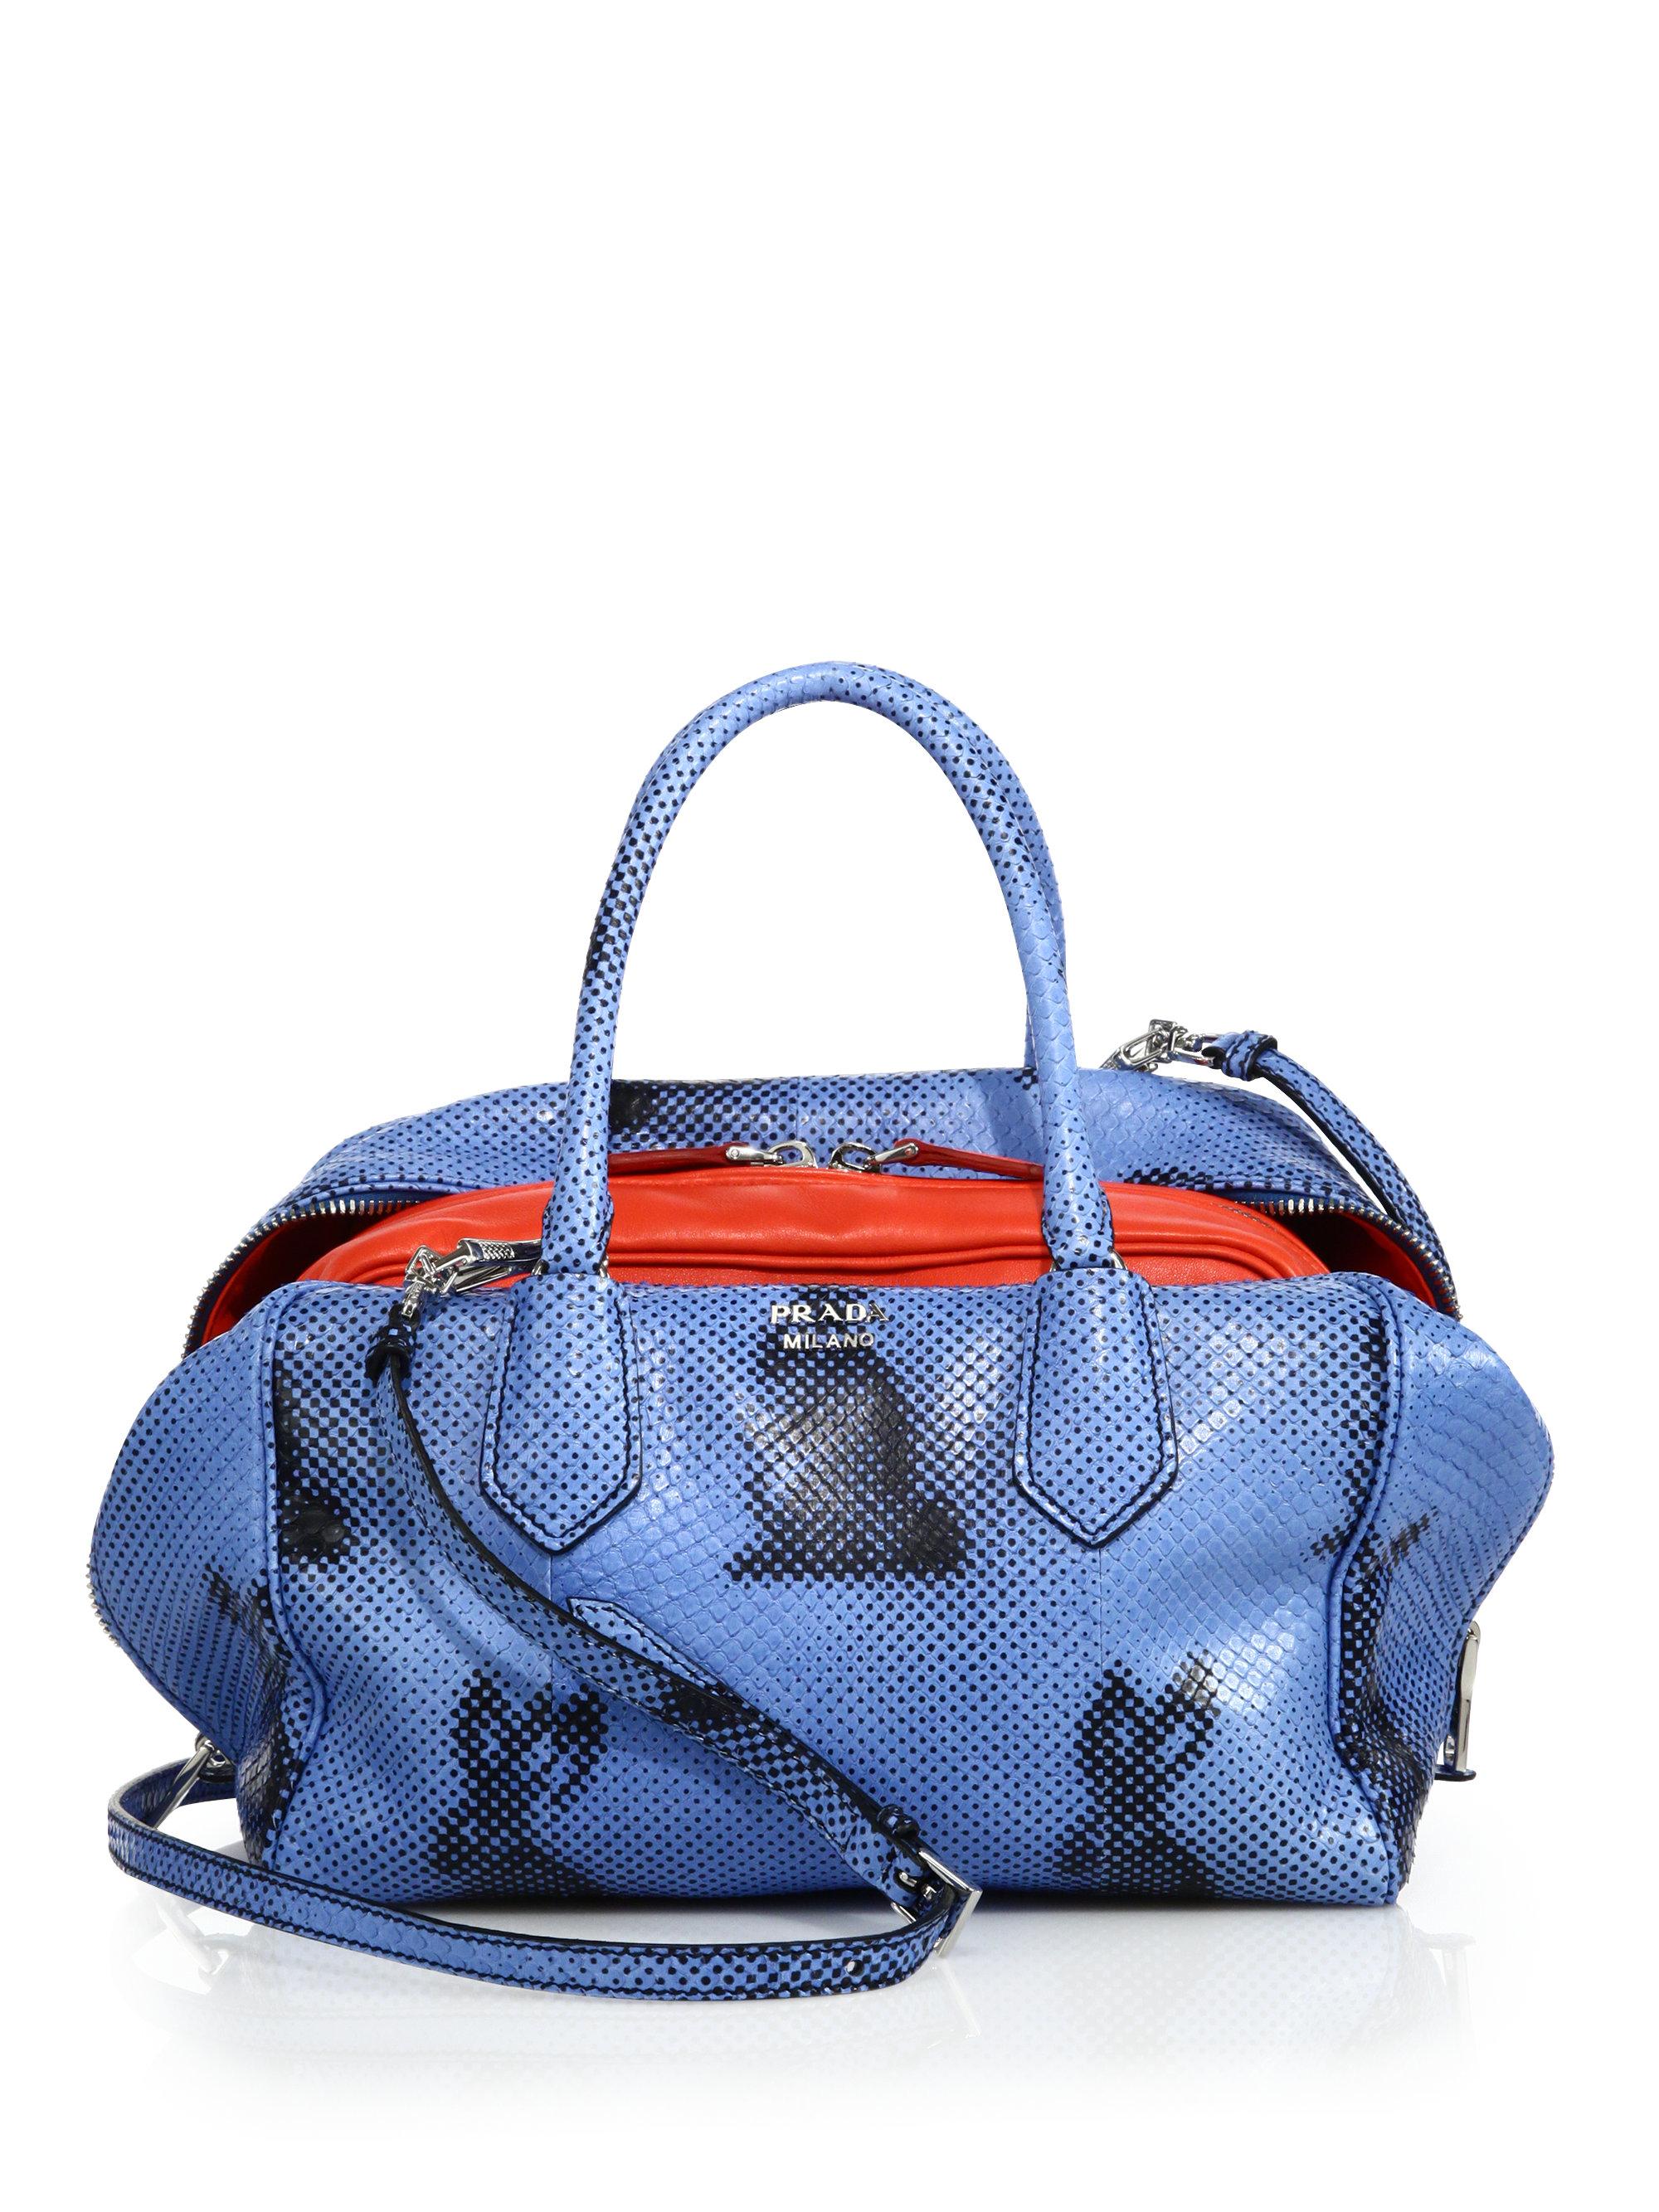 7965eb83f1e107 discount code for lyst prada rabbit print python inside bag in blue b77a9  f6f76